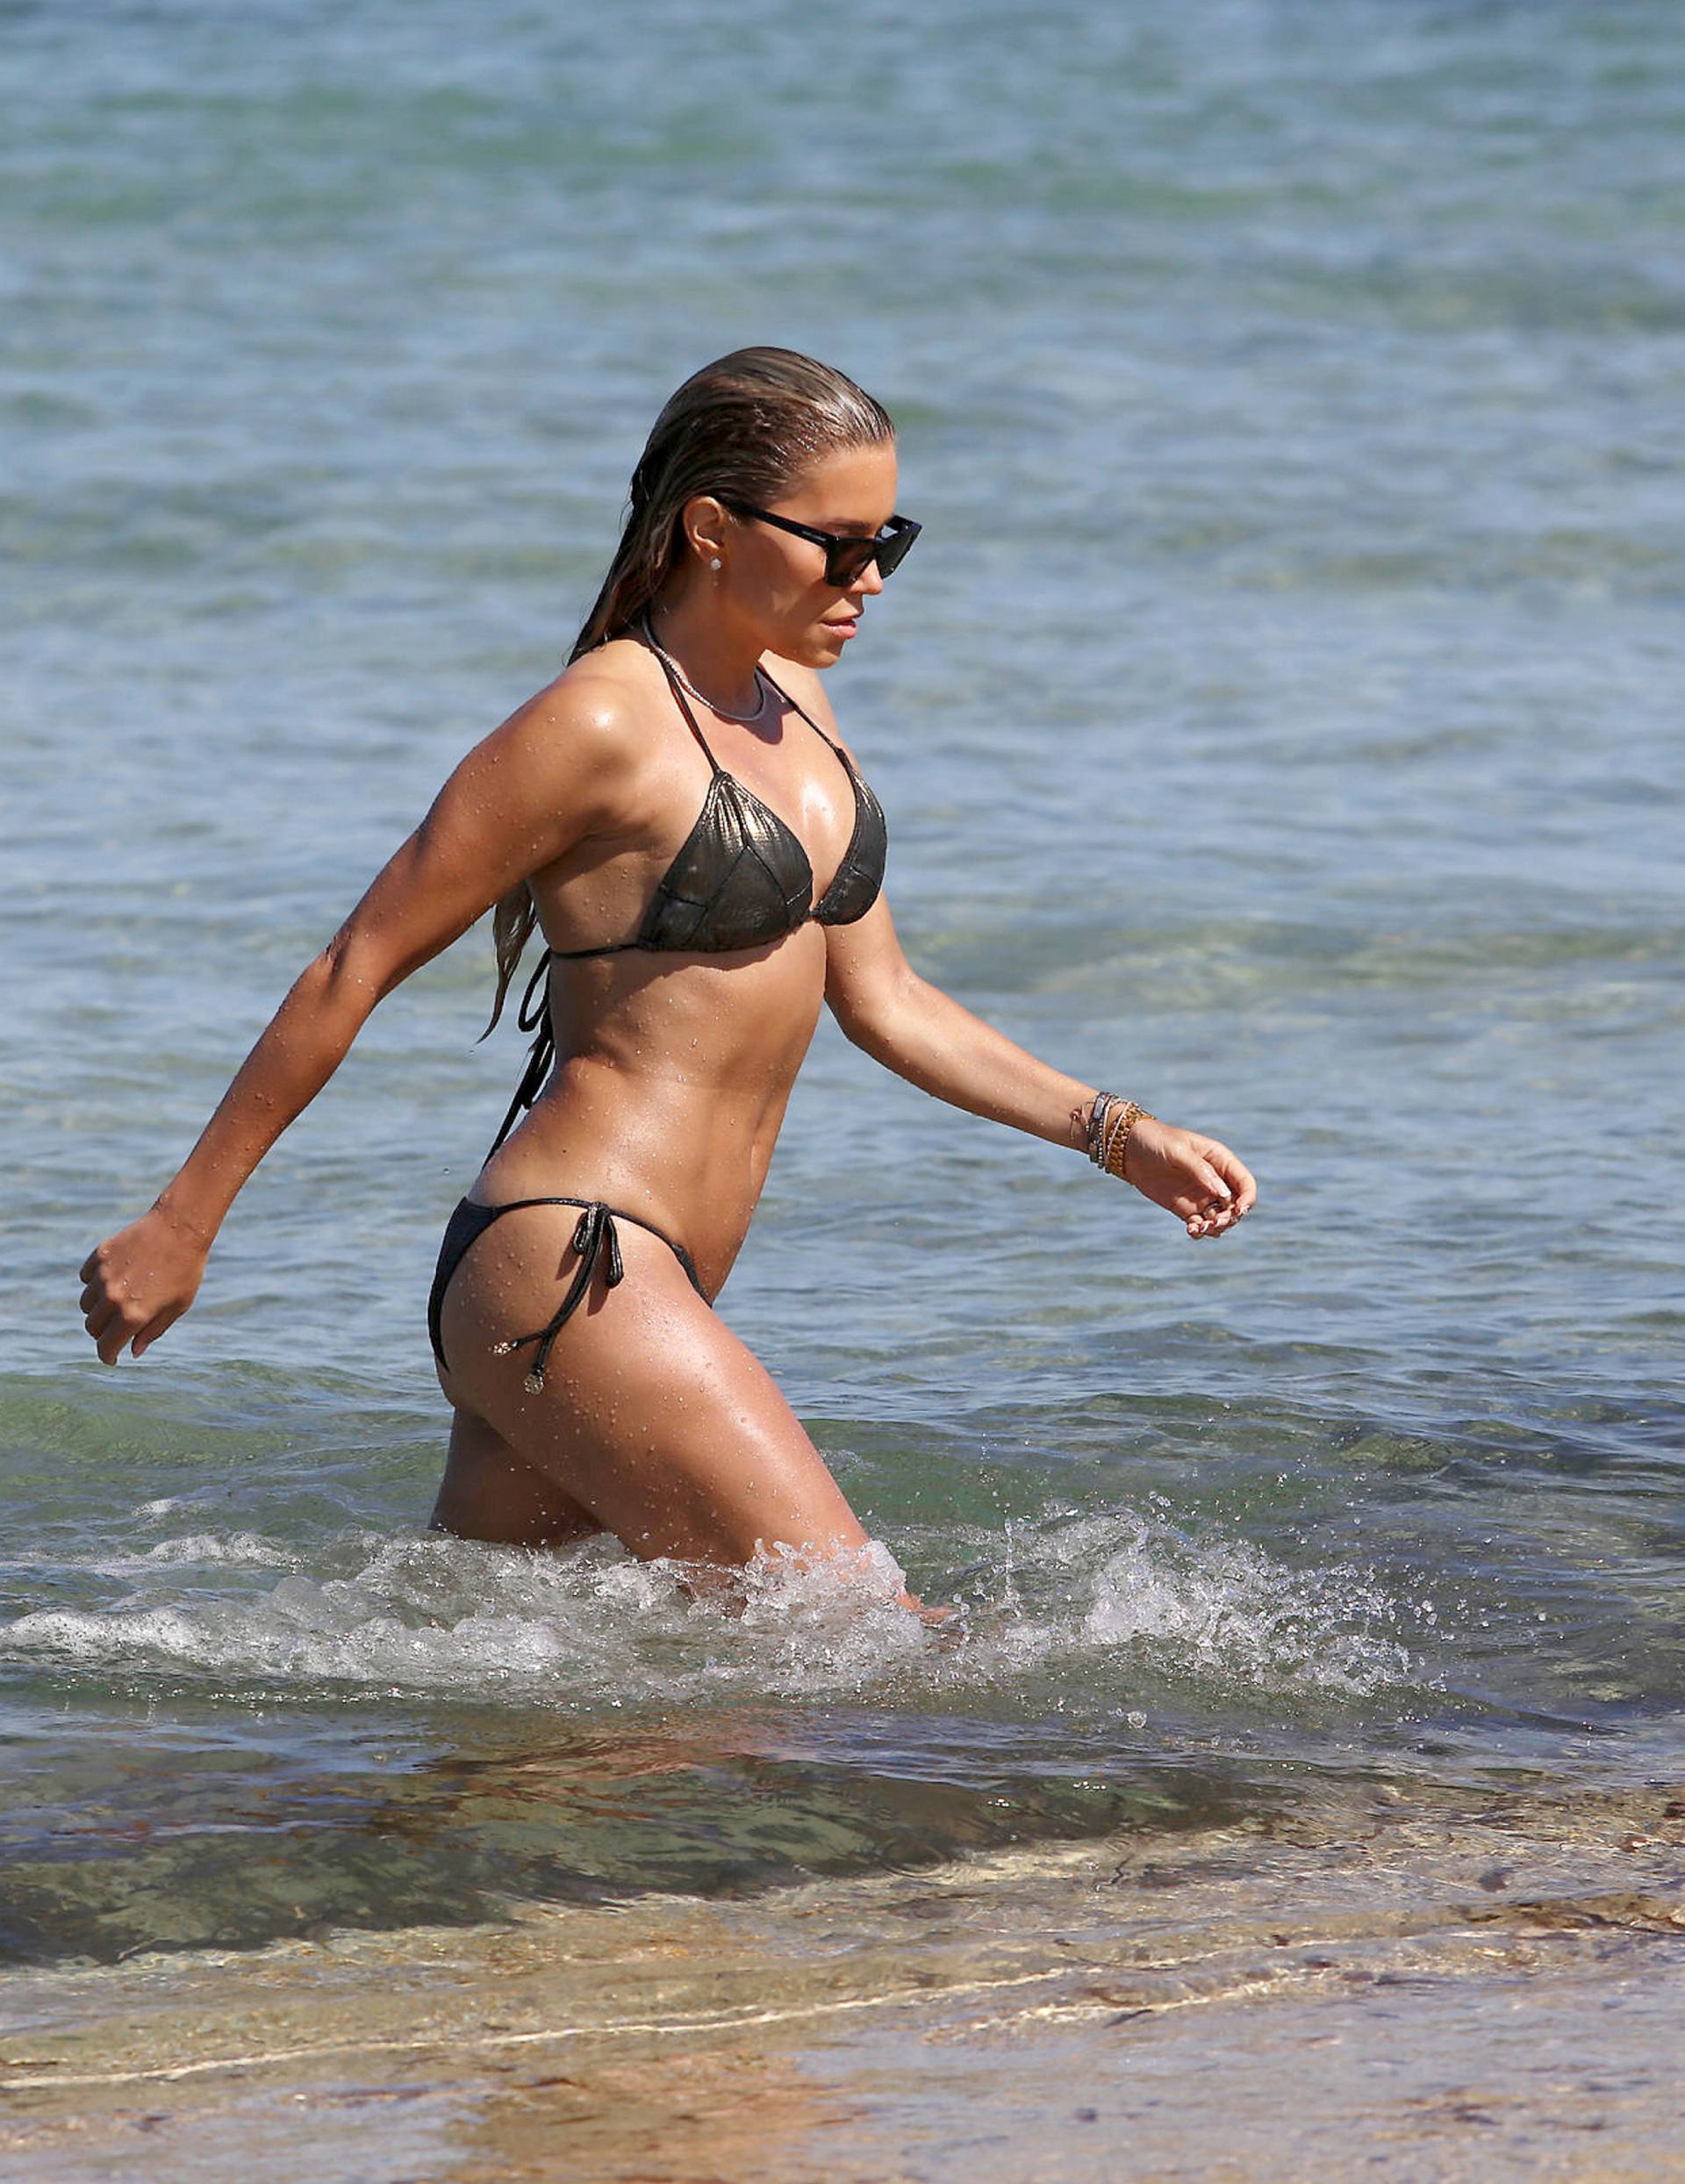 Sylvie Meis – Sexy Boobs In Bikini On The Beach In Saint Tropez 0006